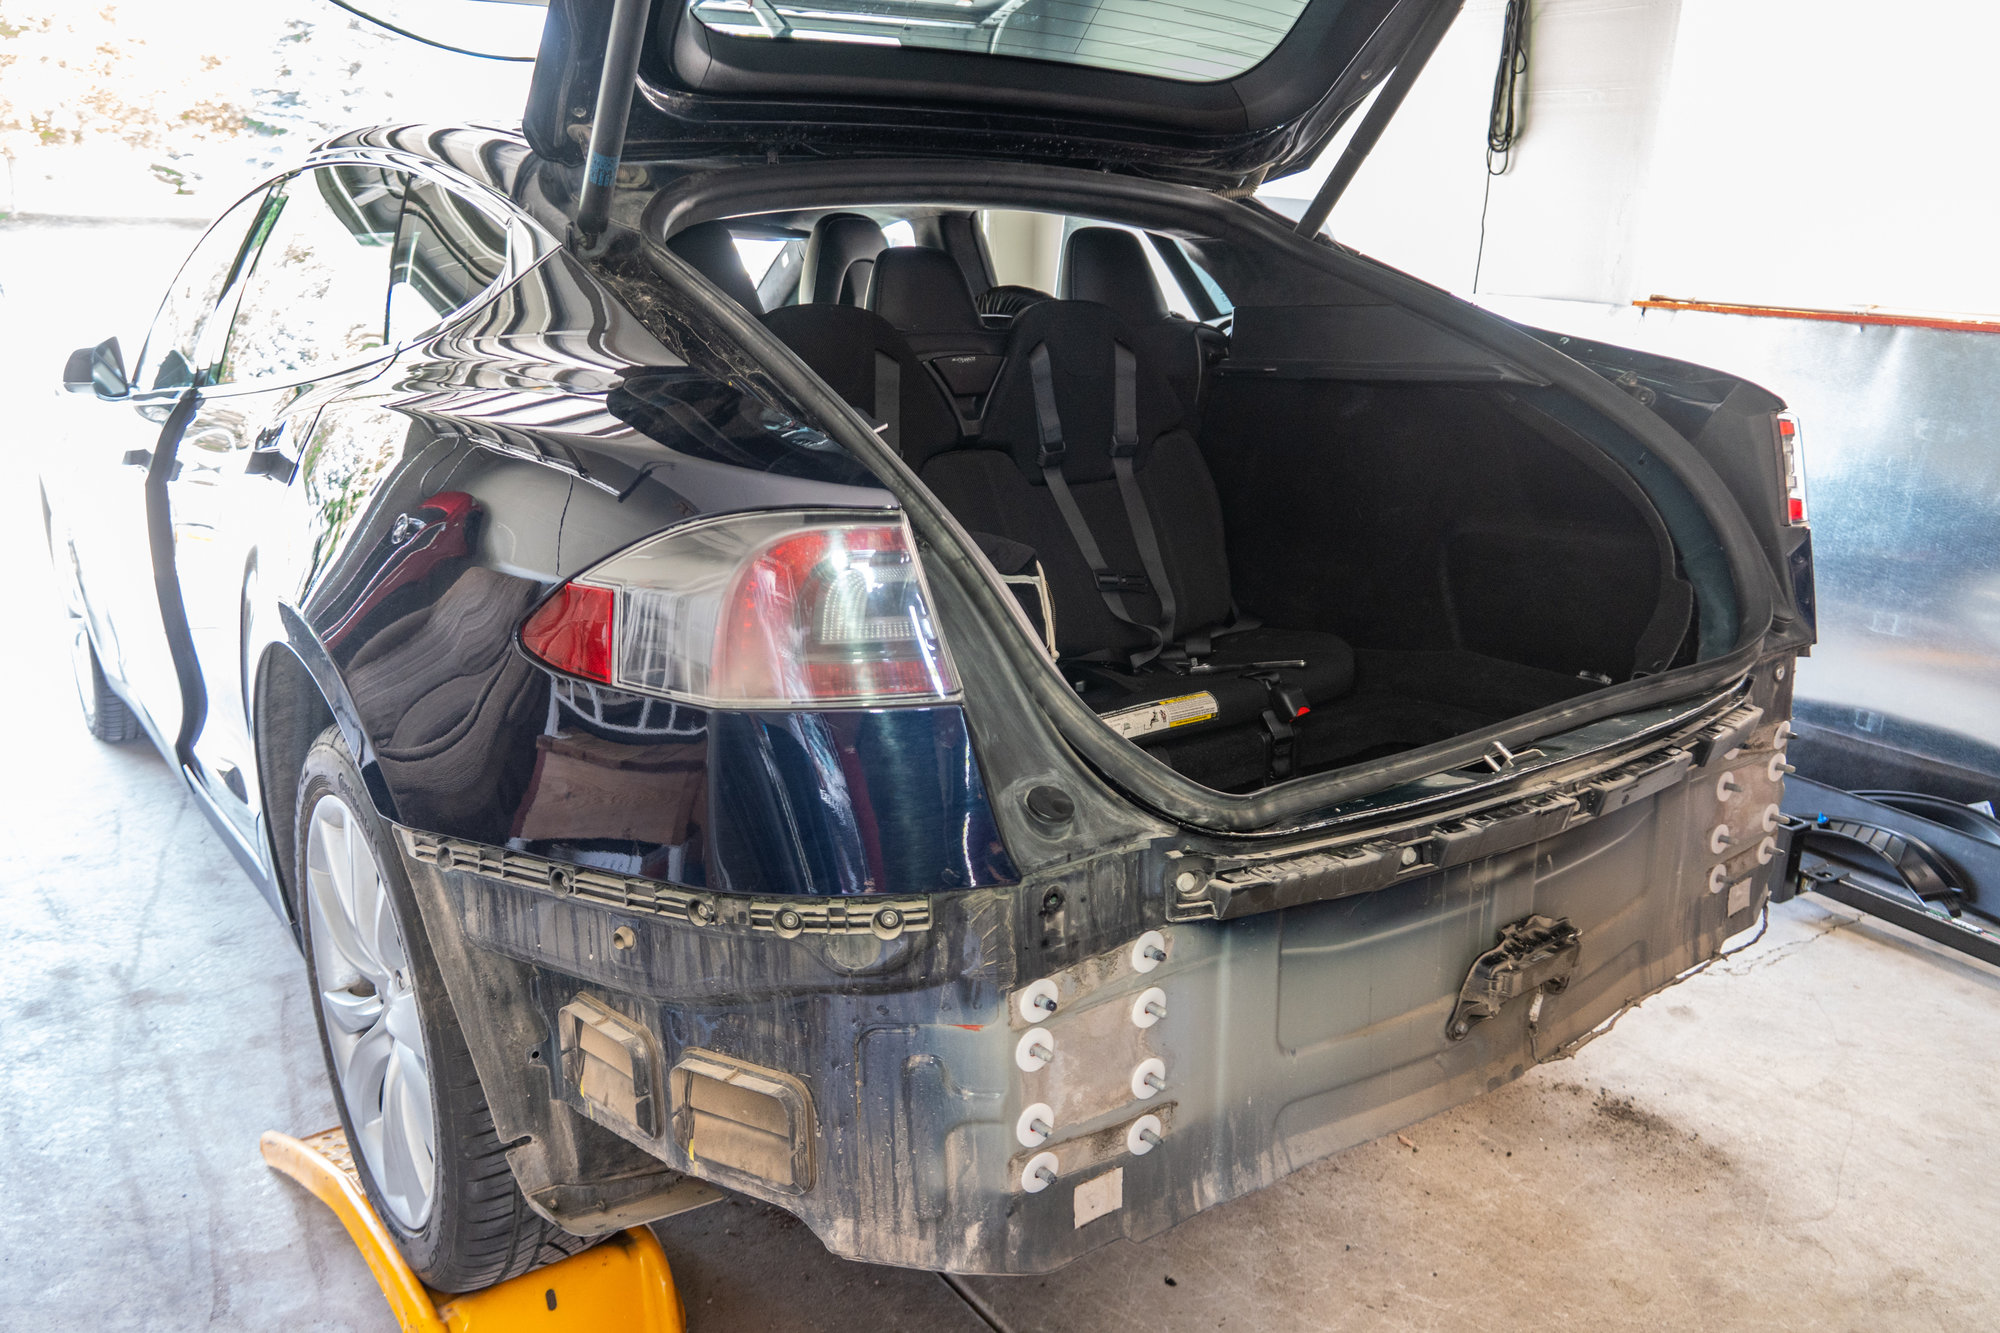 2020 05 30 Tesla Model S Trailer Hitch Installation 001.jpg